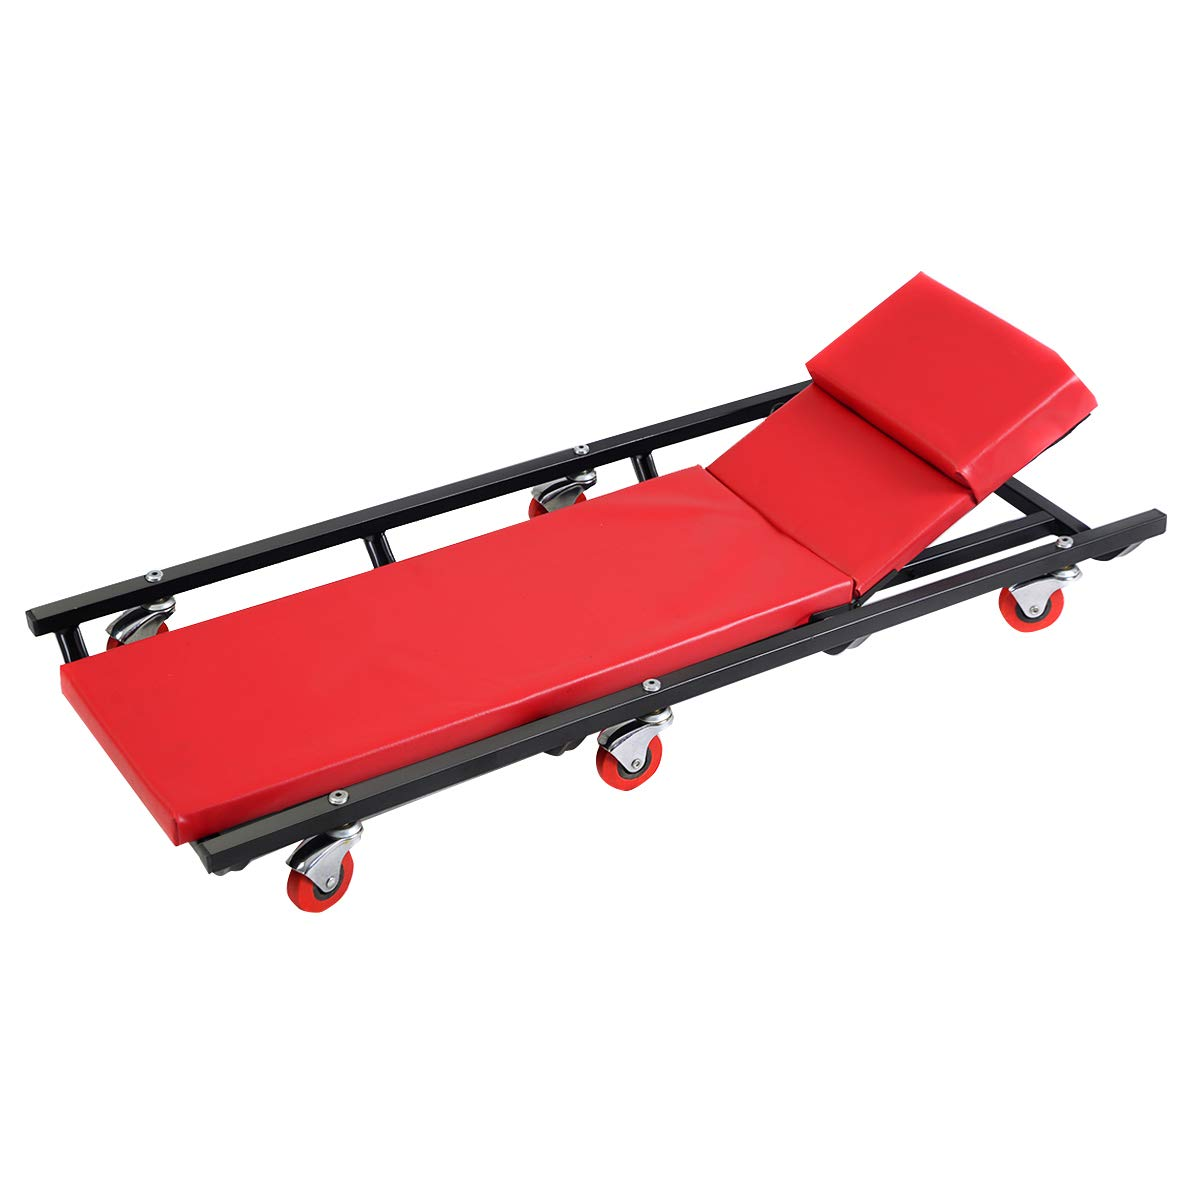 Goplus Mechanic Car Creeper, 40 Inch Shop Garage Creepers with Adjustable Lying Board, 6 Universal Wheels, Folding Rolling Garage Creeper 300lbs Capacity (Red)